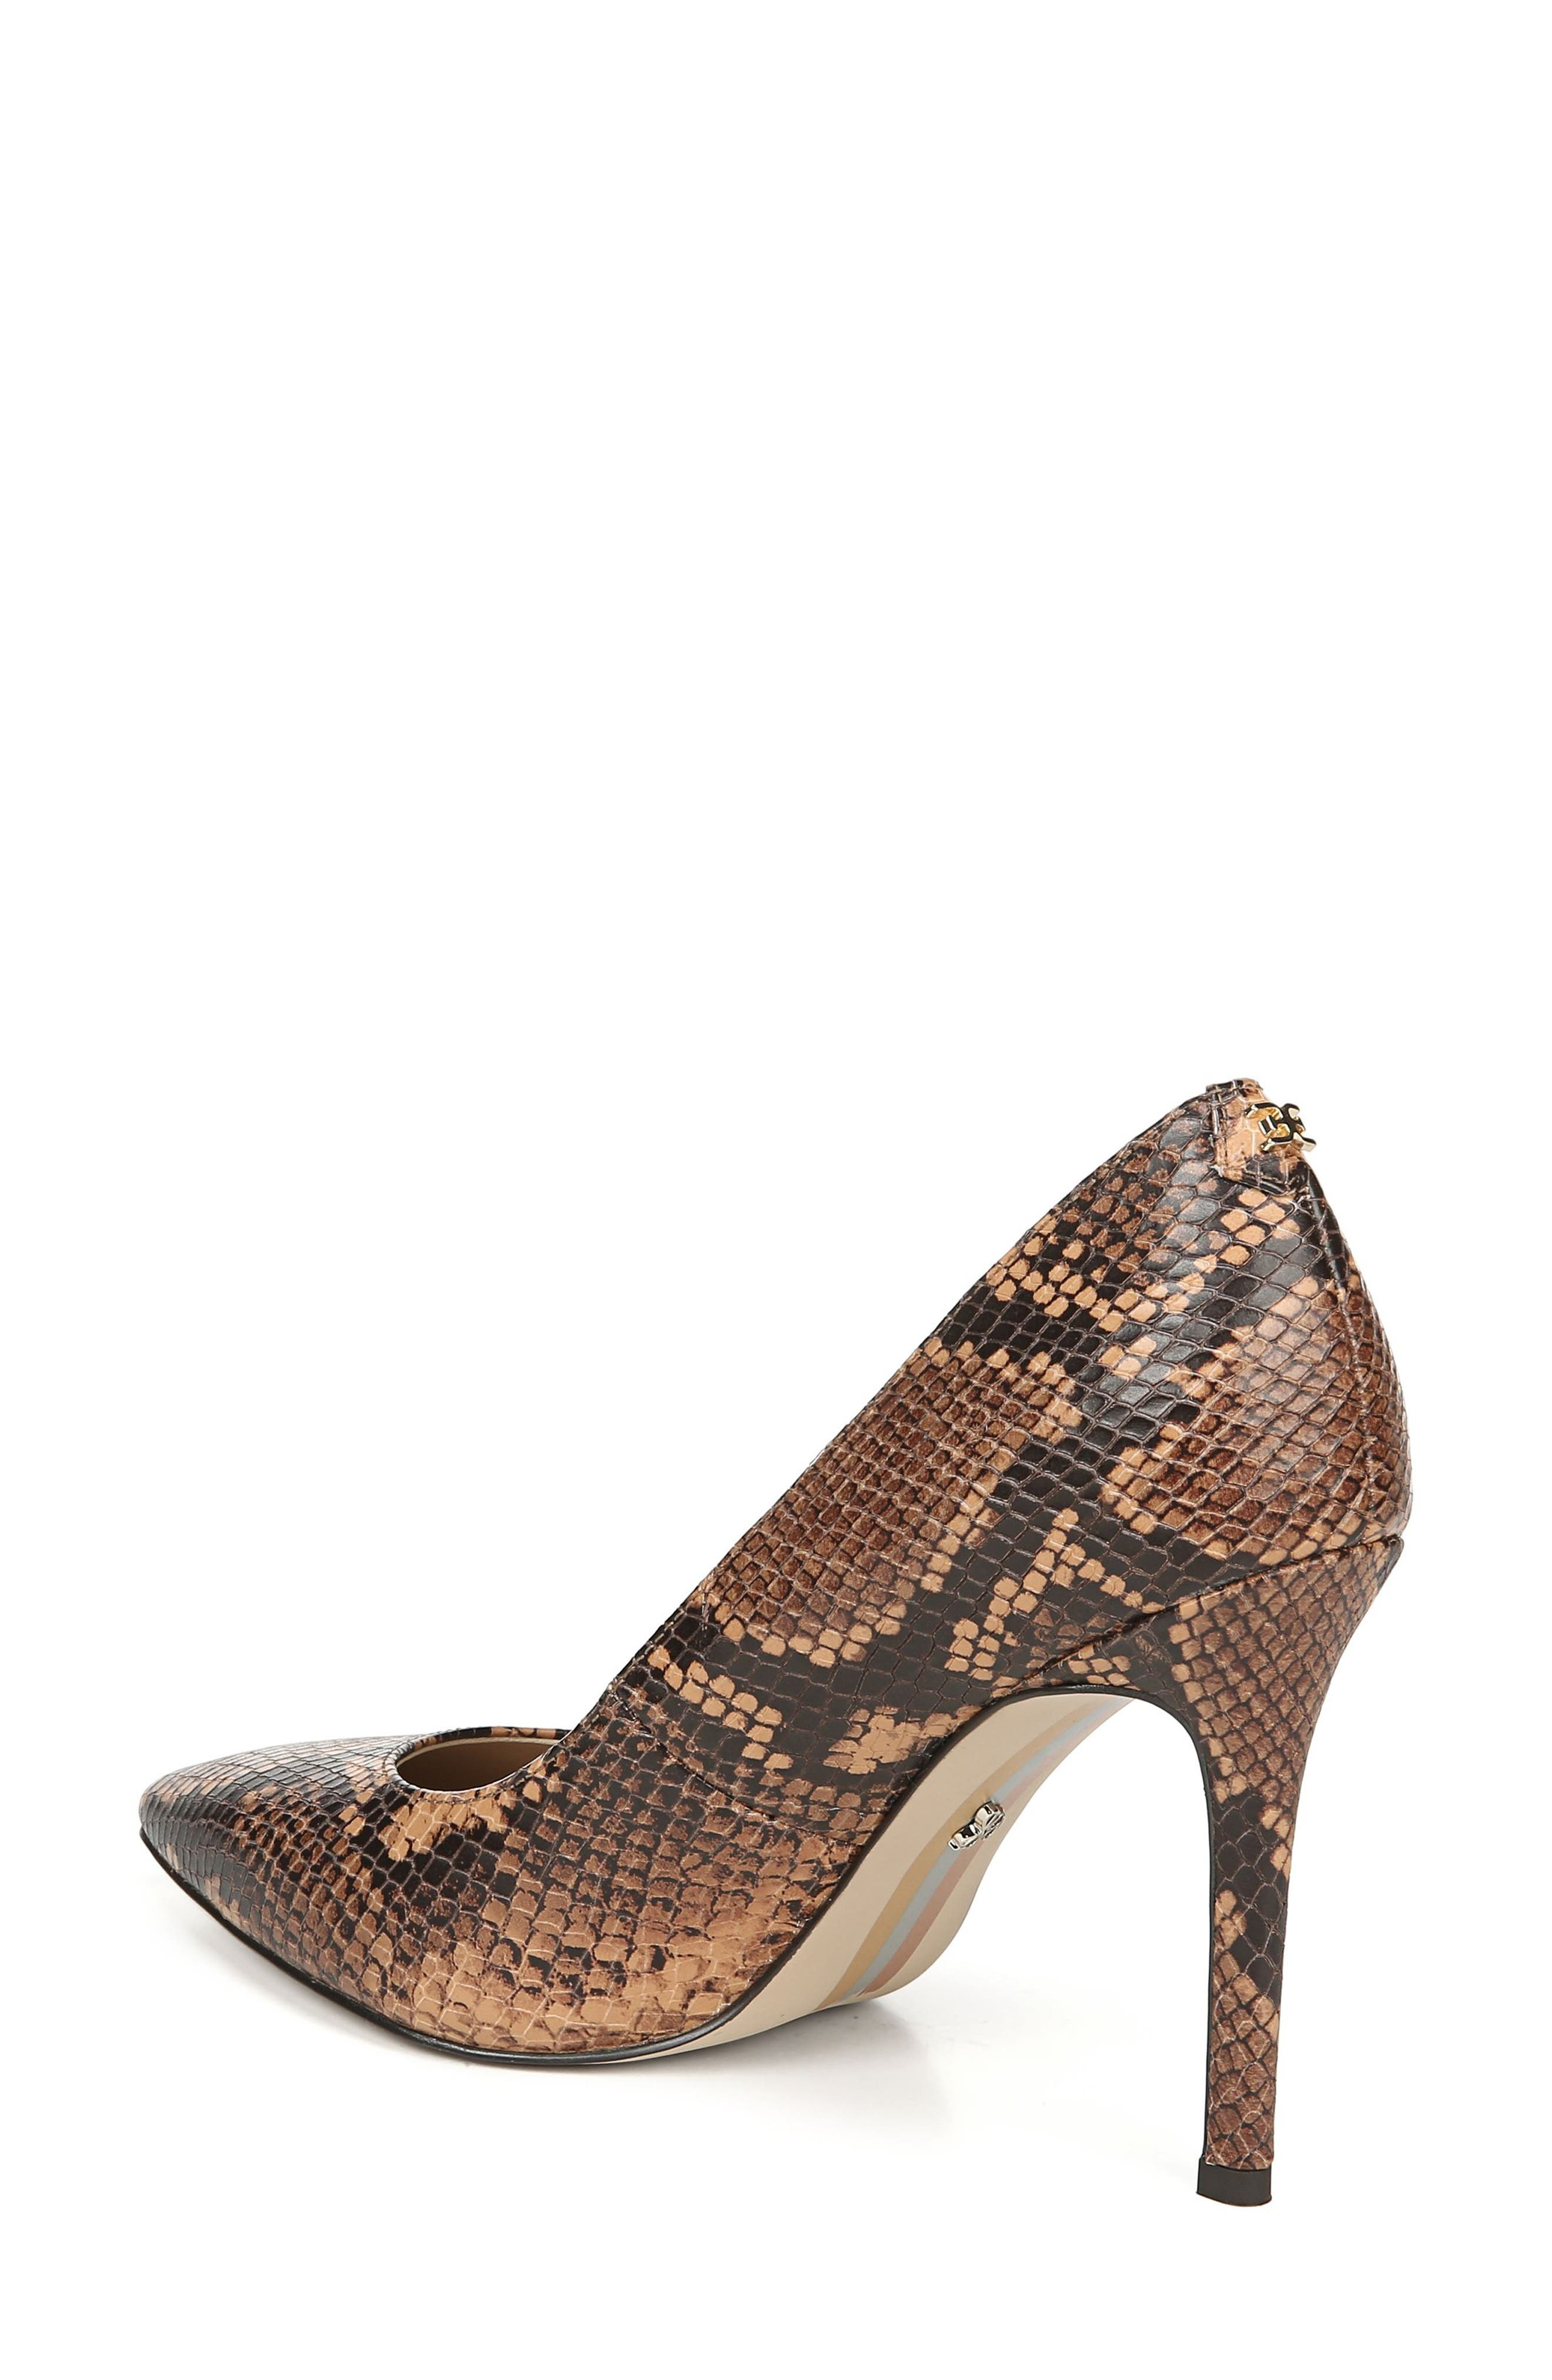 36c66b932 Women's Sam Edelman Narrow Shoes | Nordstrom